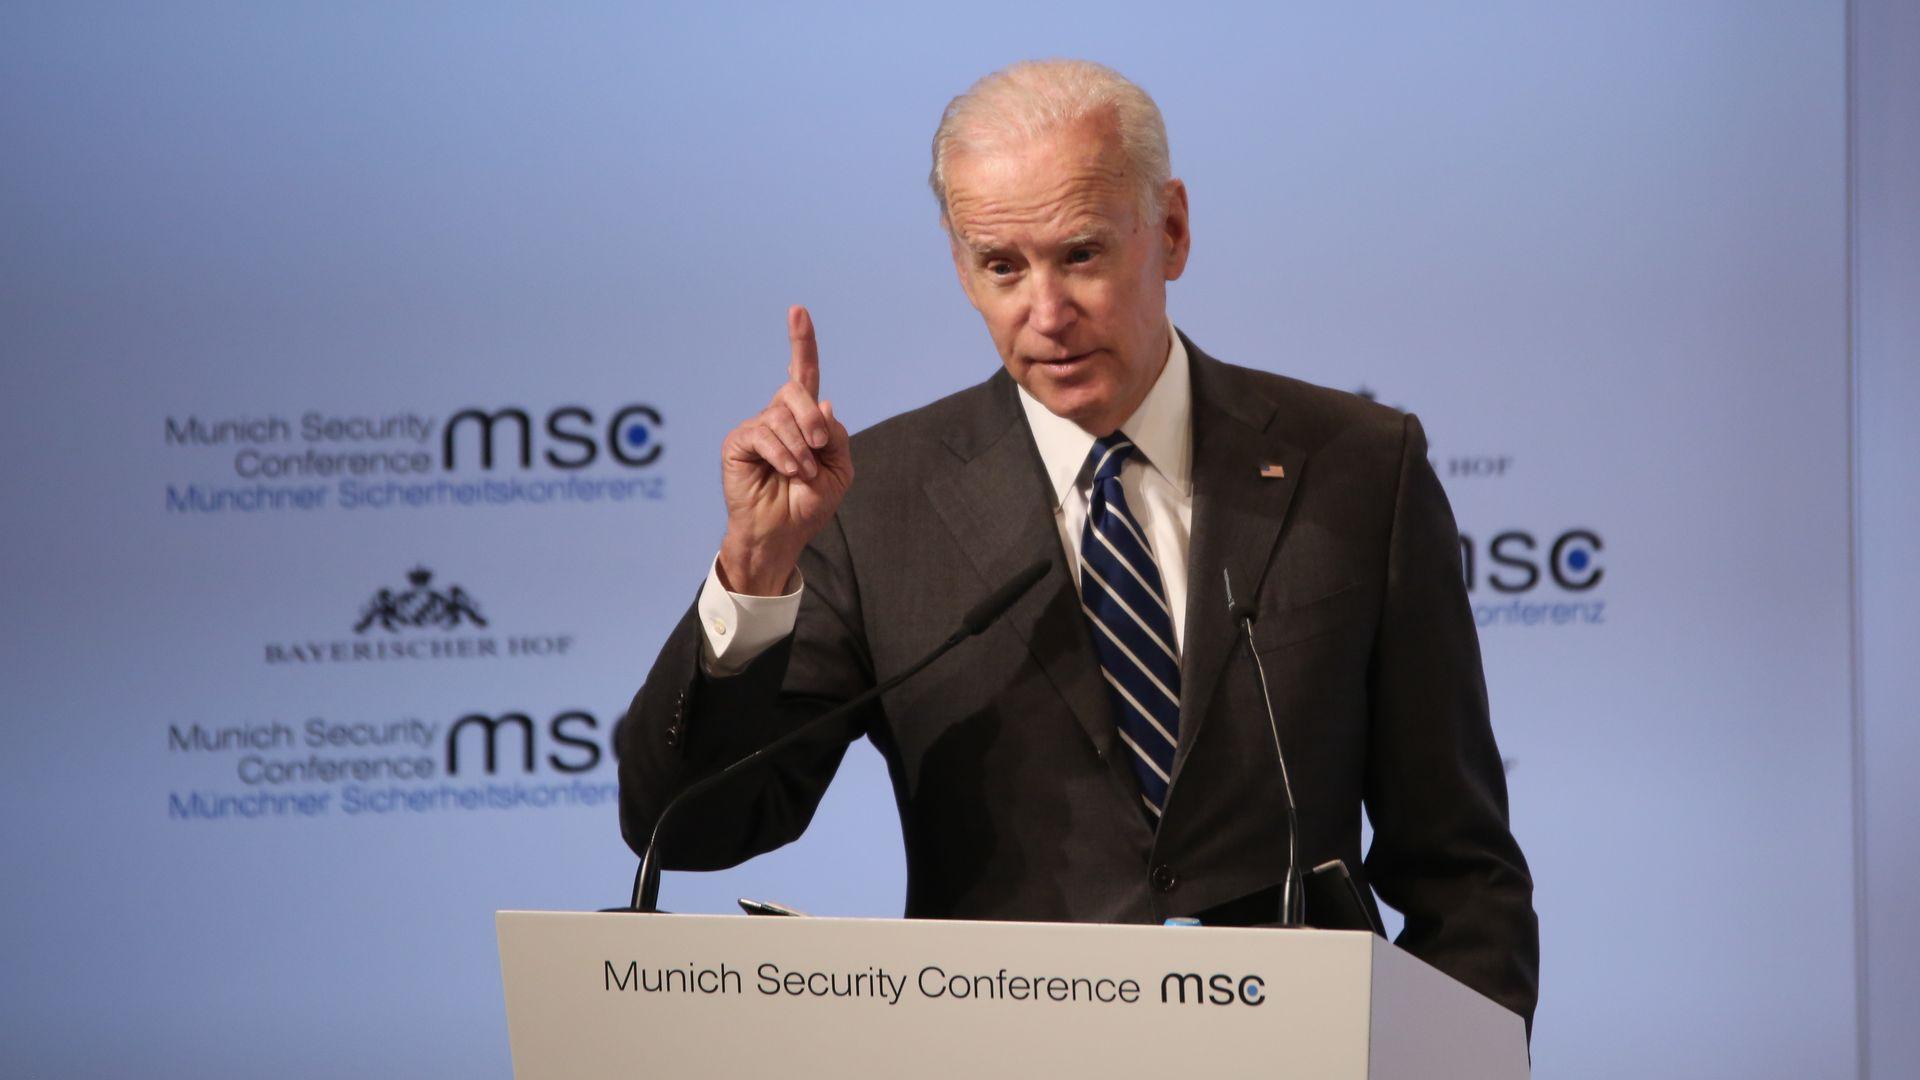 Joe Biden's 2020 signals